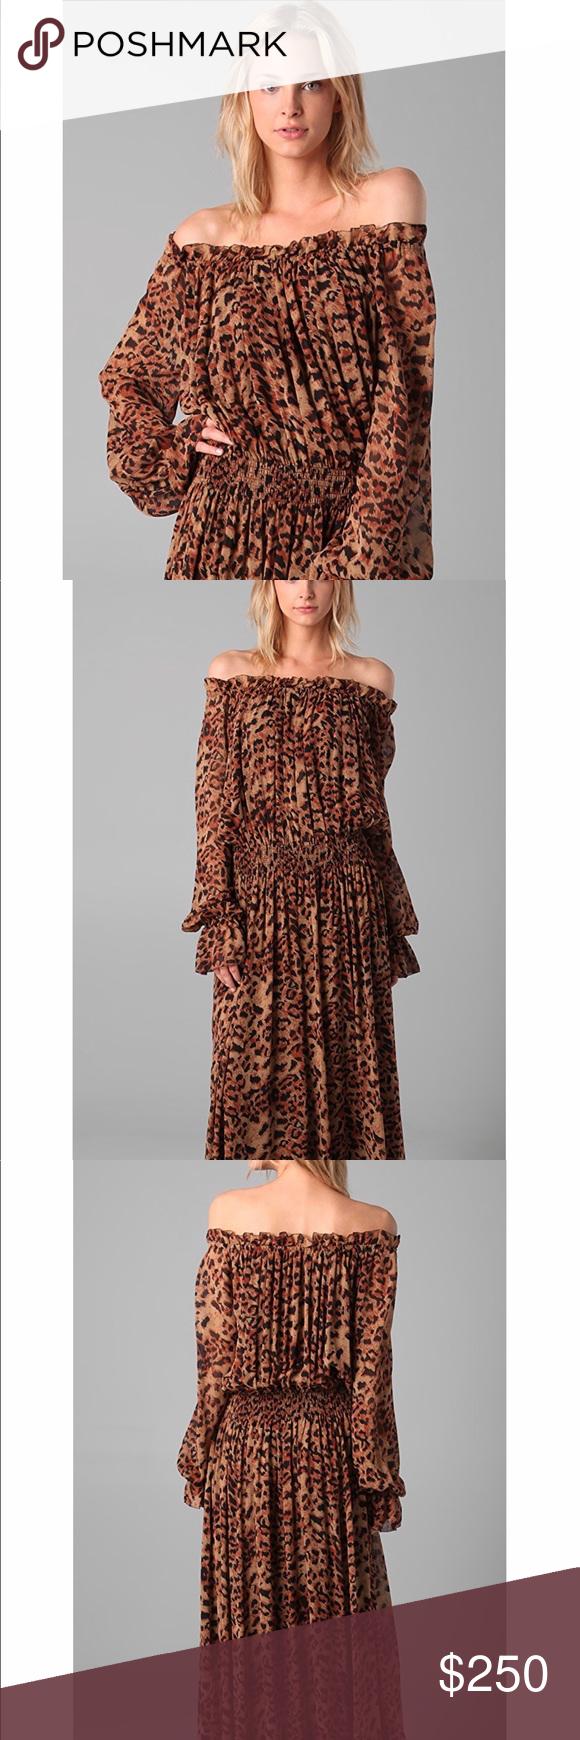 Rachel Zoe Panther Leopard Print Maxi Dress Leopard Print Maxi Dress Printed Maxi Dress Dresses [ 1740 x 580 Pixel ]